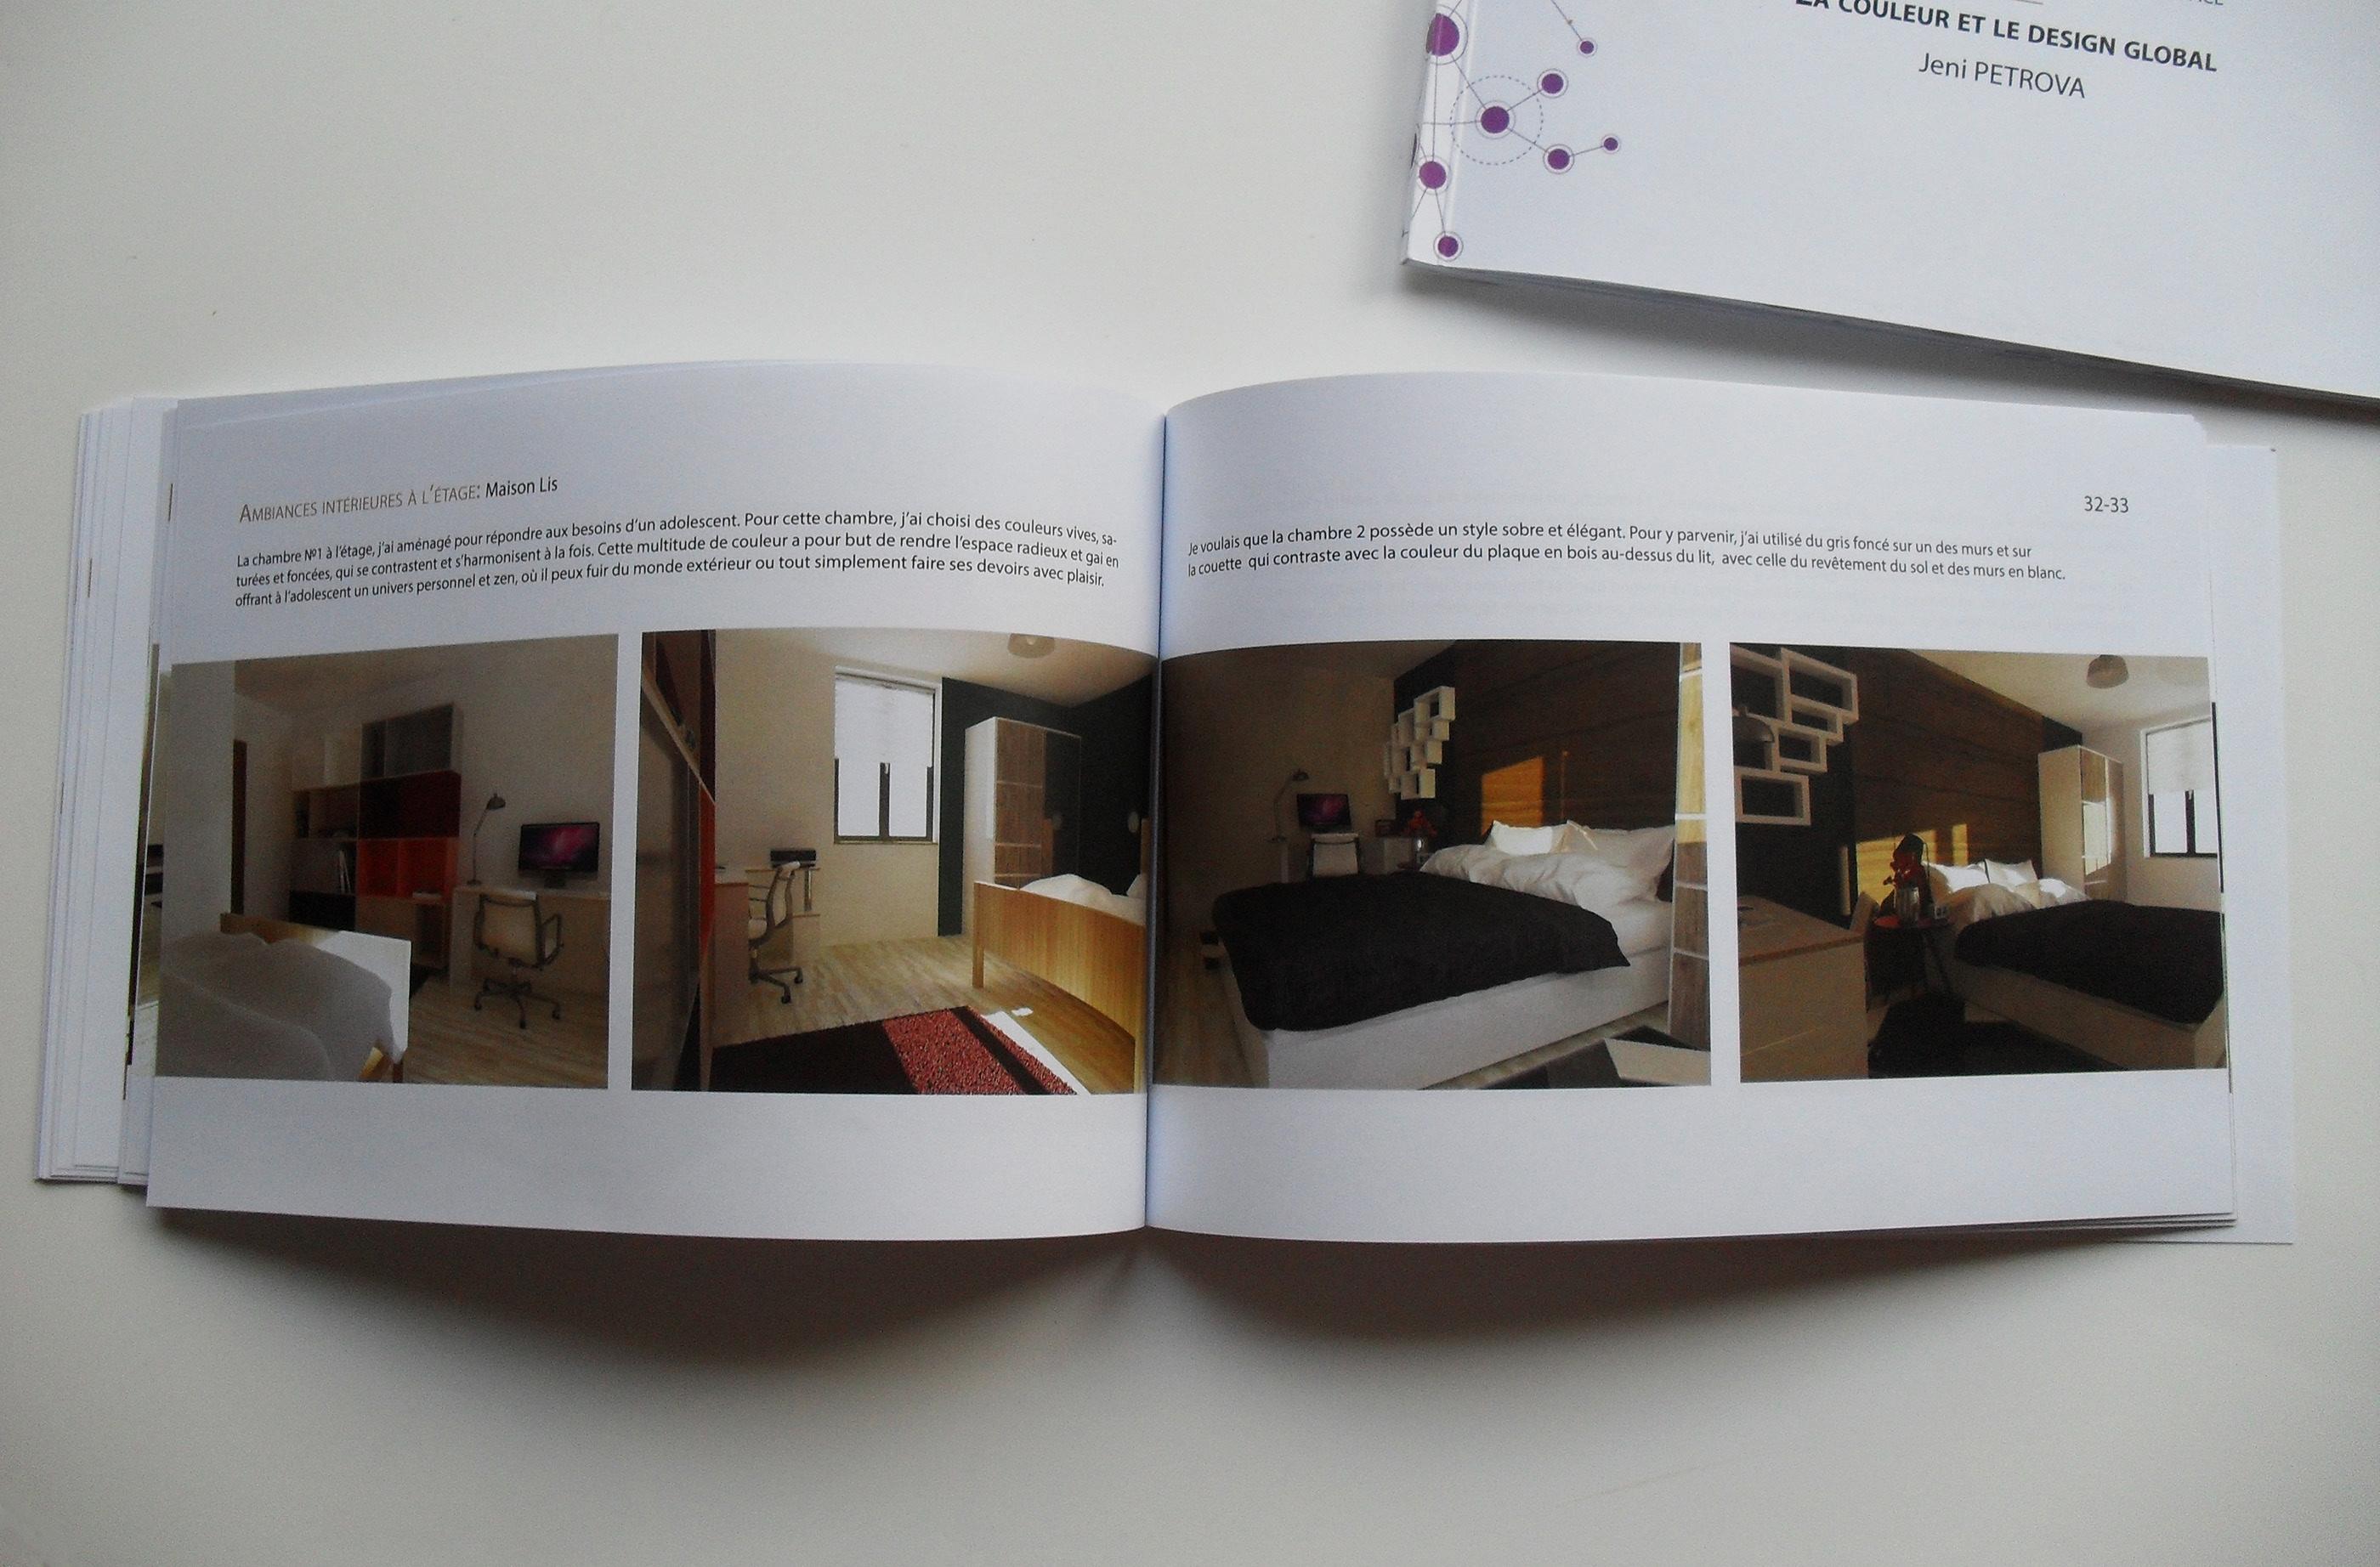 Lit Exterieur Design master's degree thesis on behance